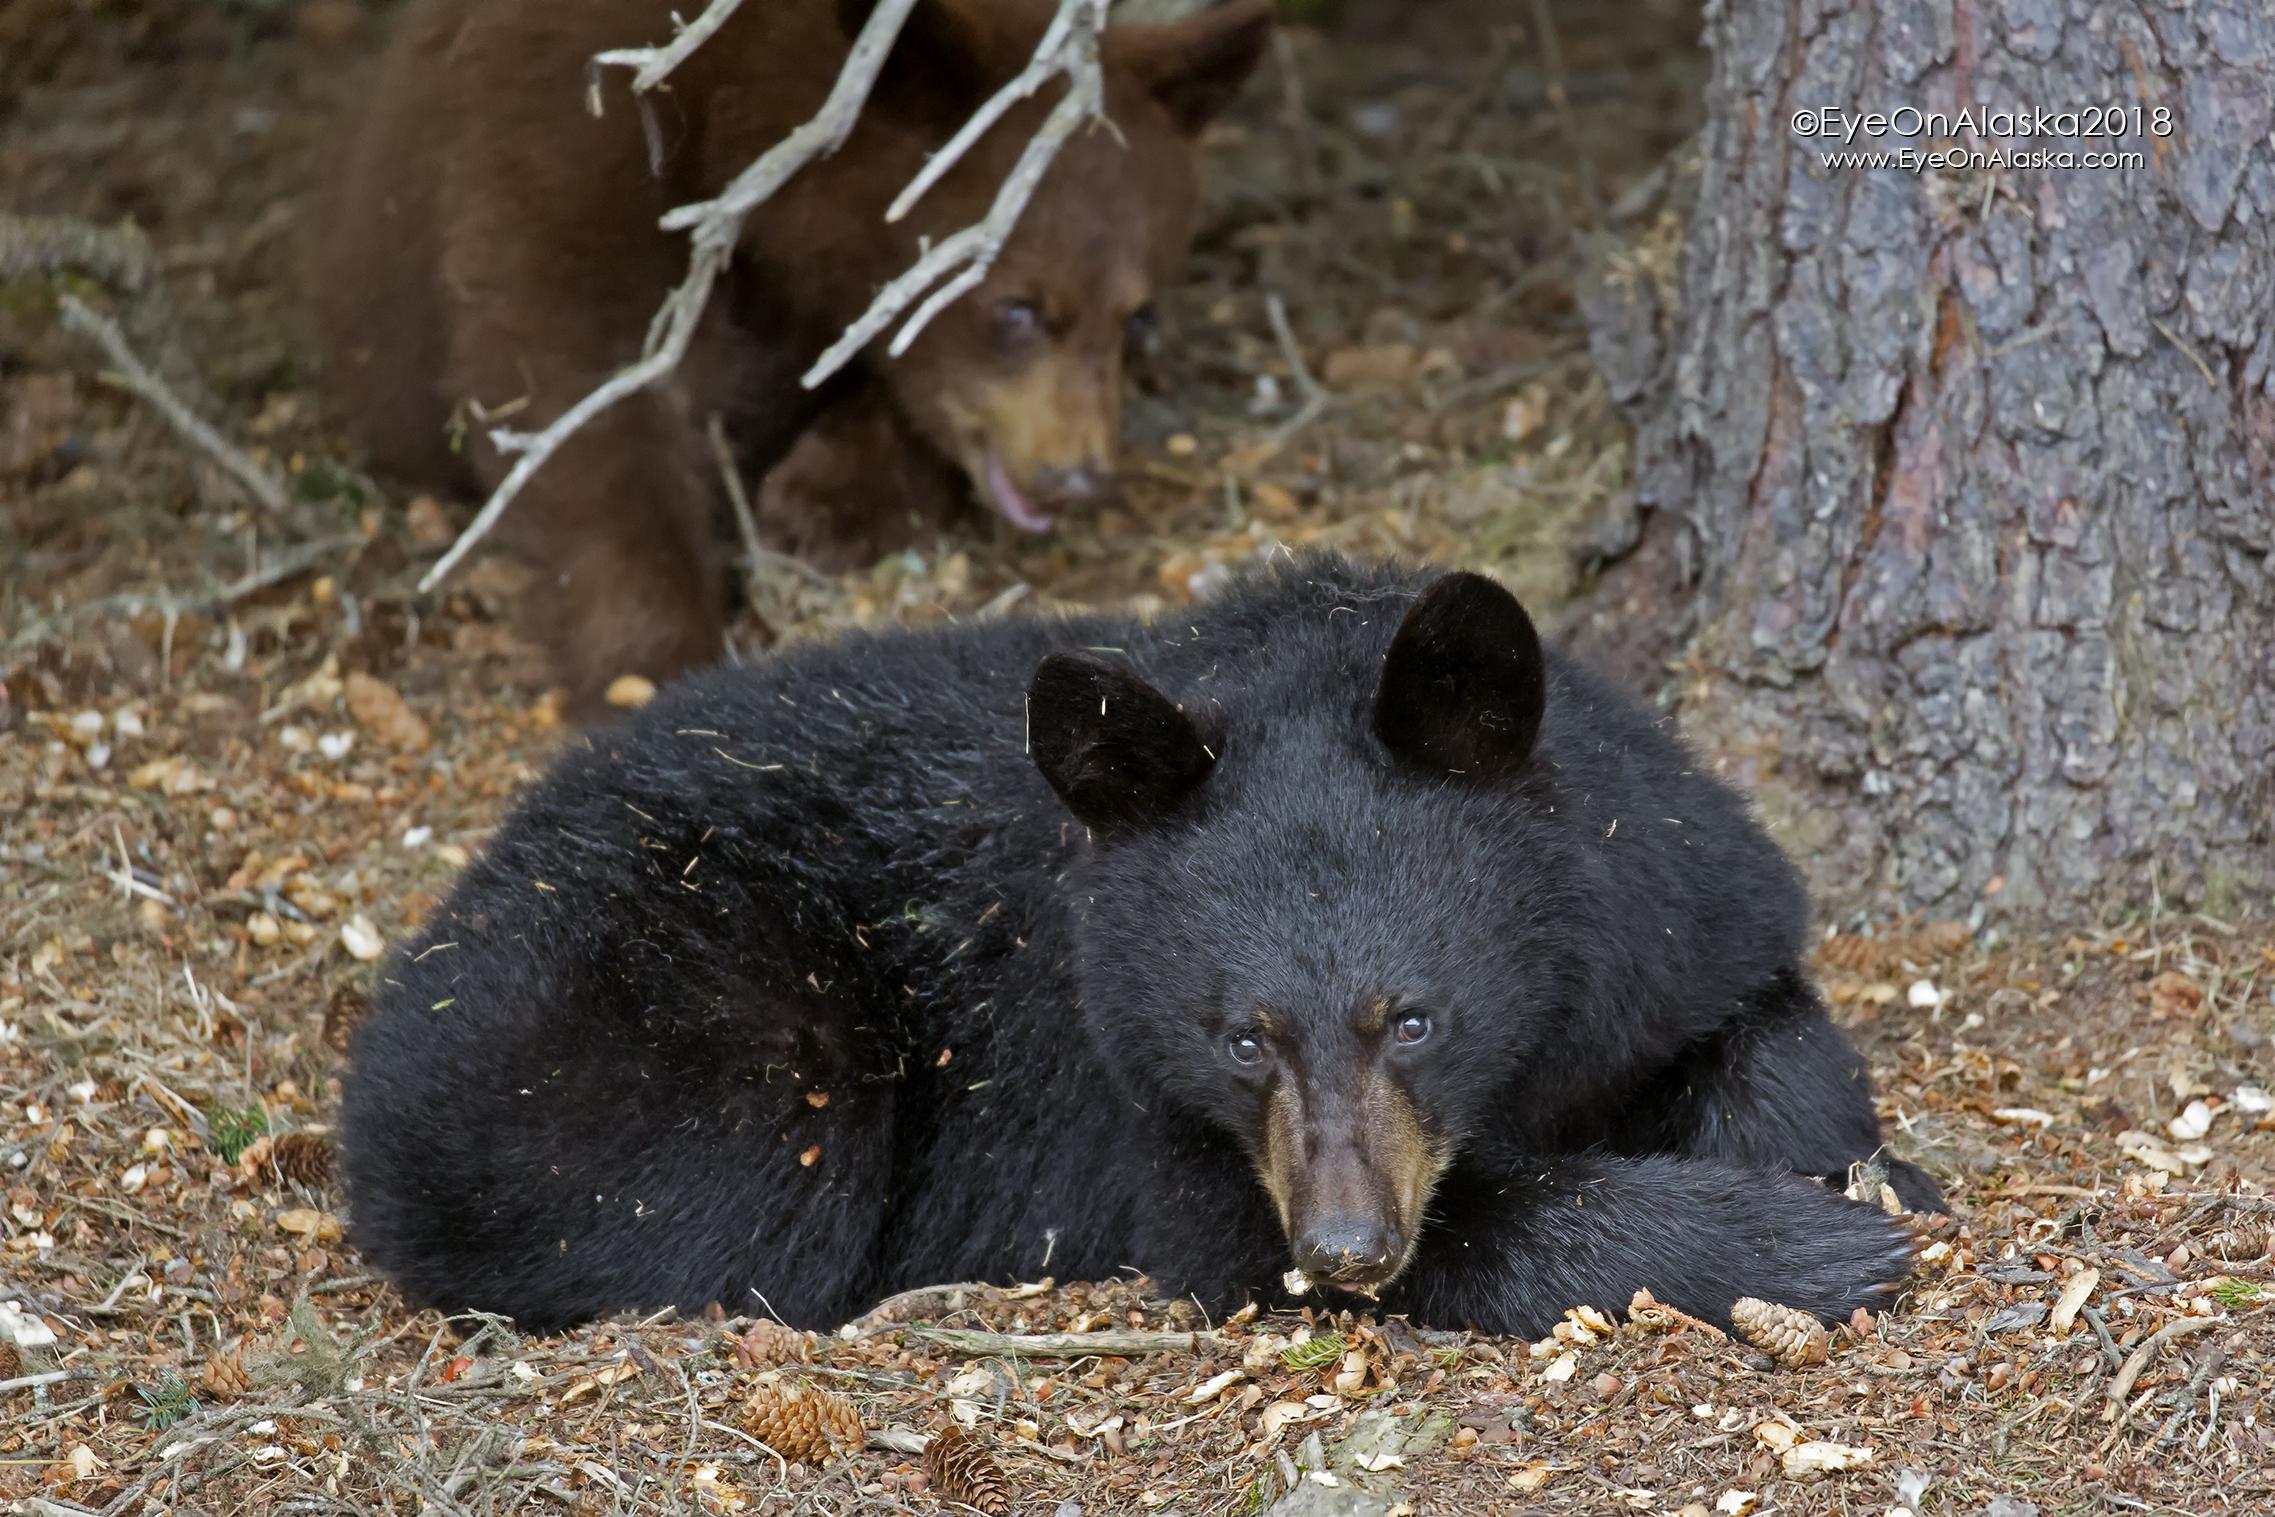 The black cub.